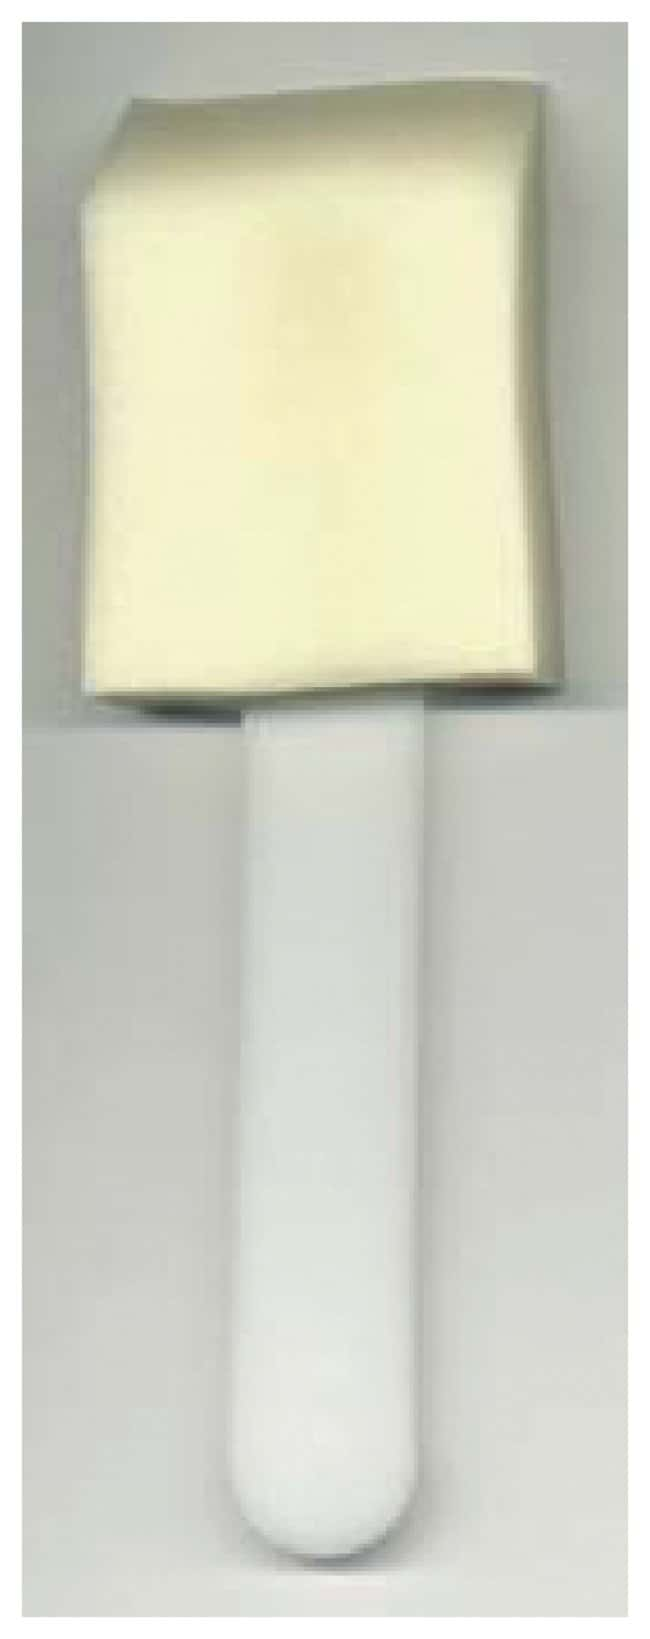 Micronova Foam Swab 1.75 x 0.75 in. on 6.50 in. handle:Gloves, Glasses